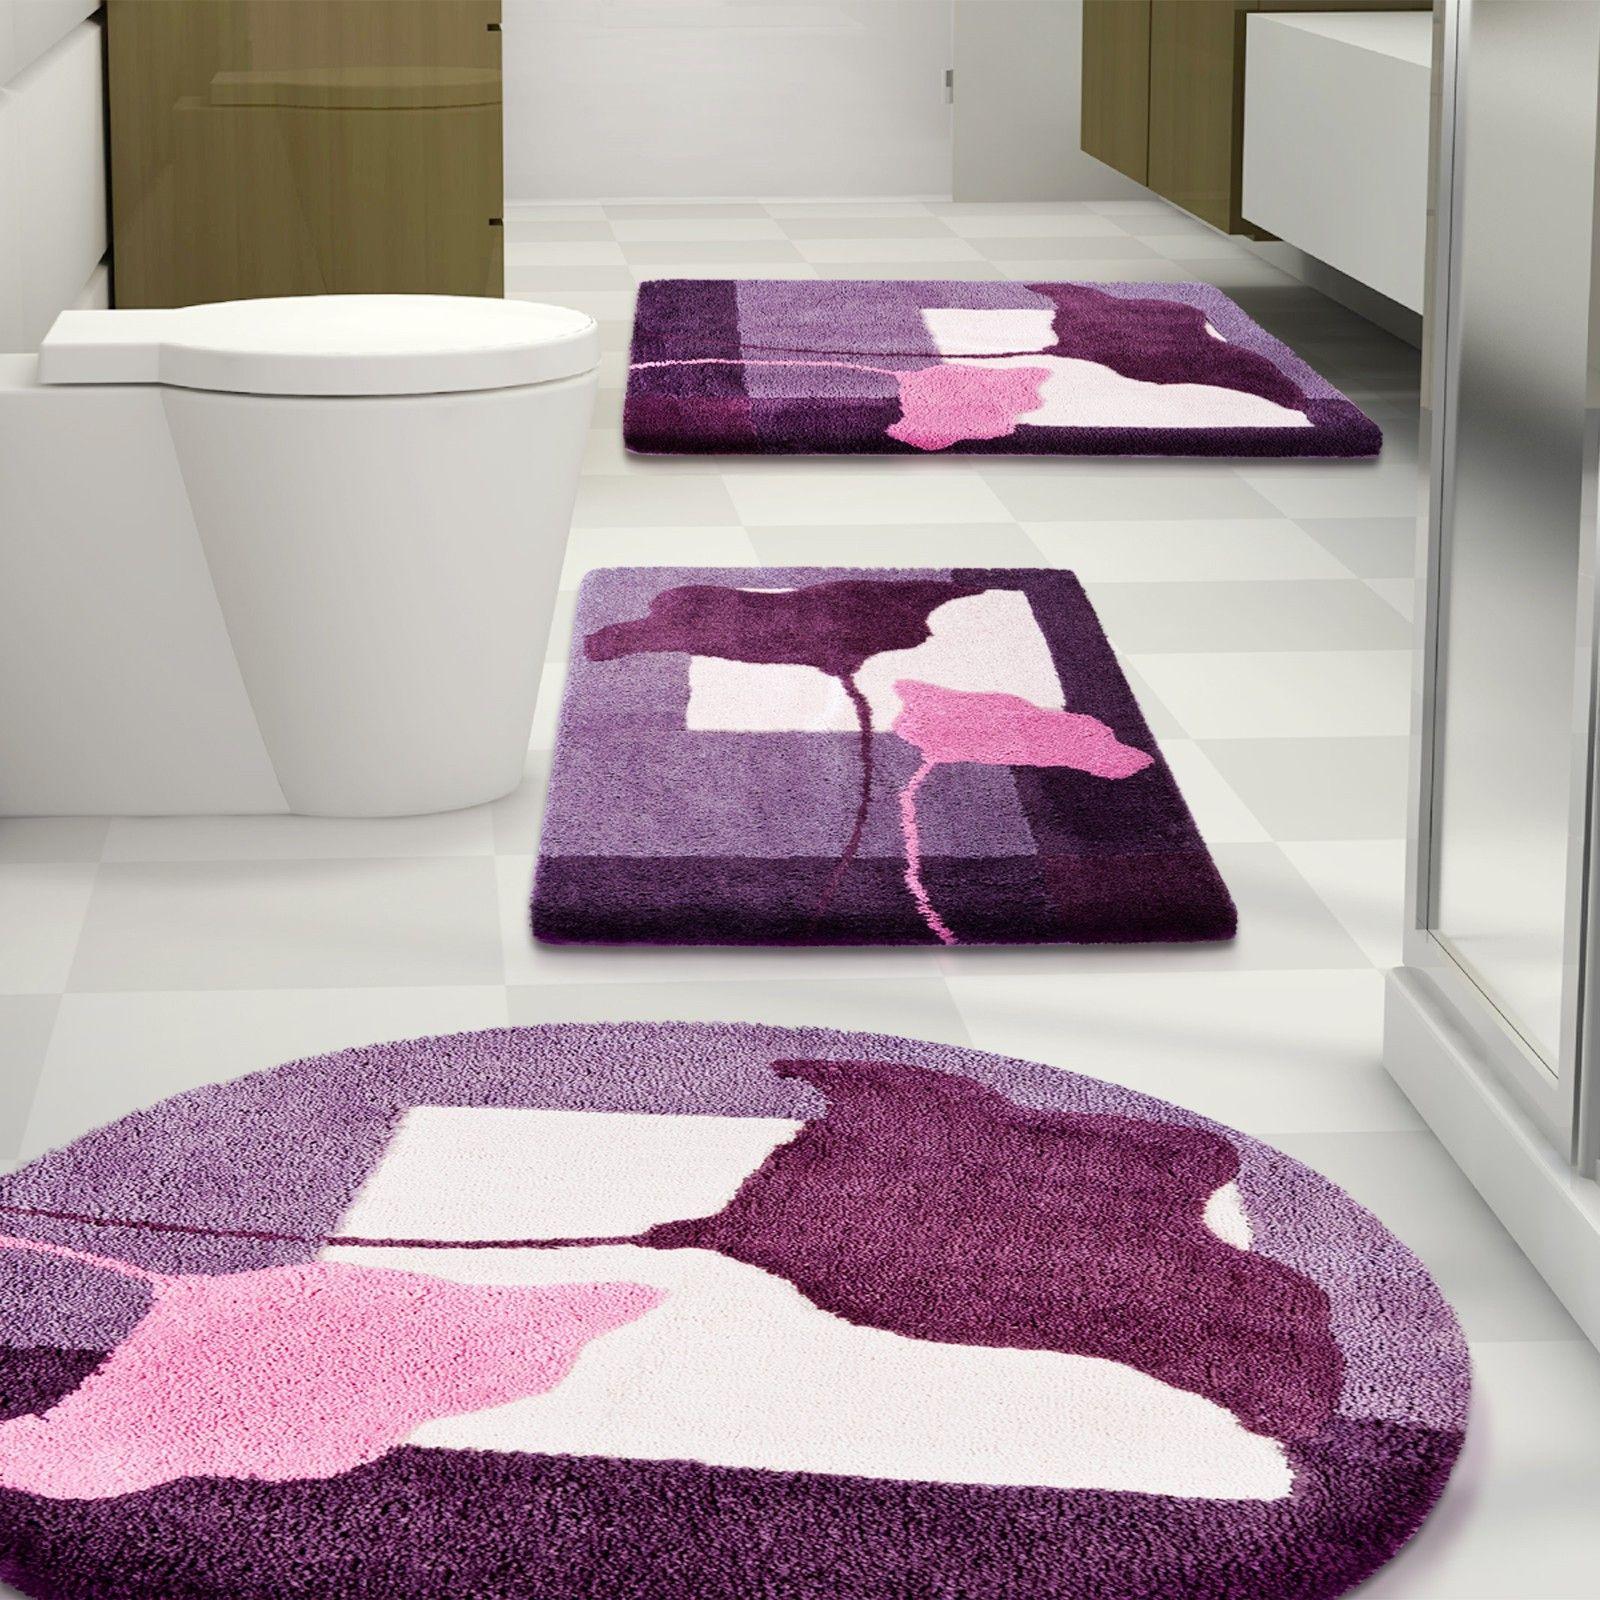 20 Unique Luxury Bath Rugs Bathroom Rugs Set You Can Look Plush Bath Rugs You Can Look With 20 Unique L Bathroom Rug Sets Purple Bathrooms Pink Bathroom Rugs [ 1600 x 1600 Pixel ]